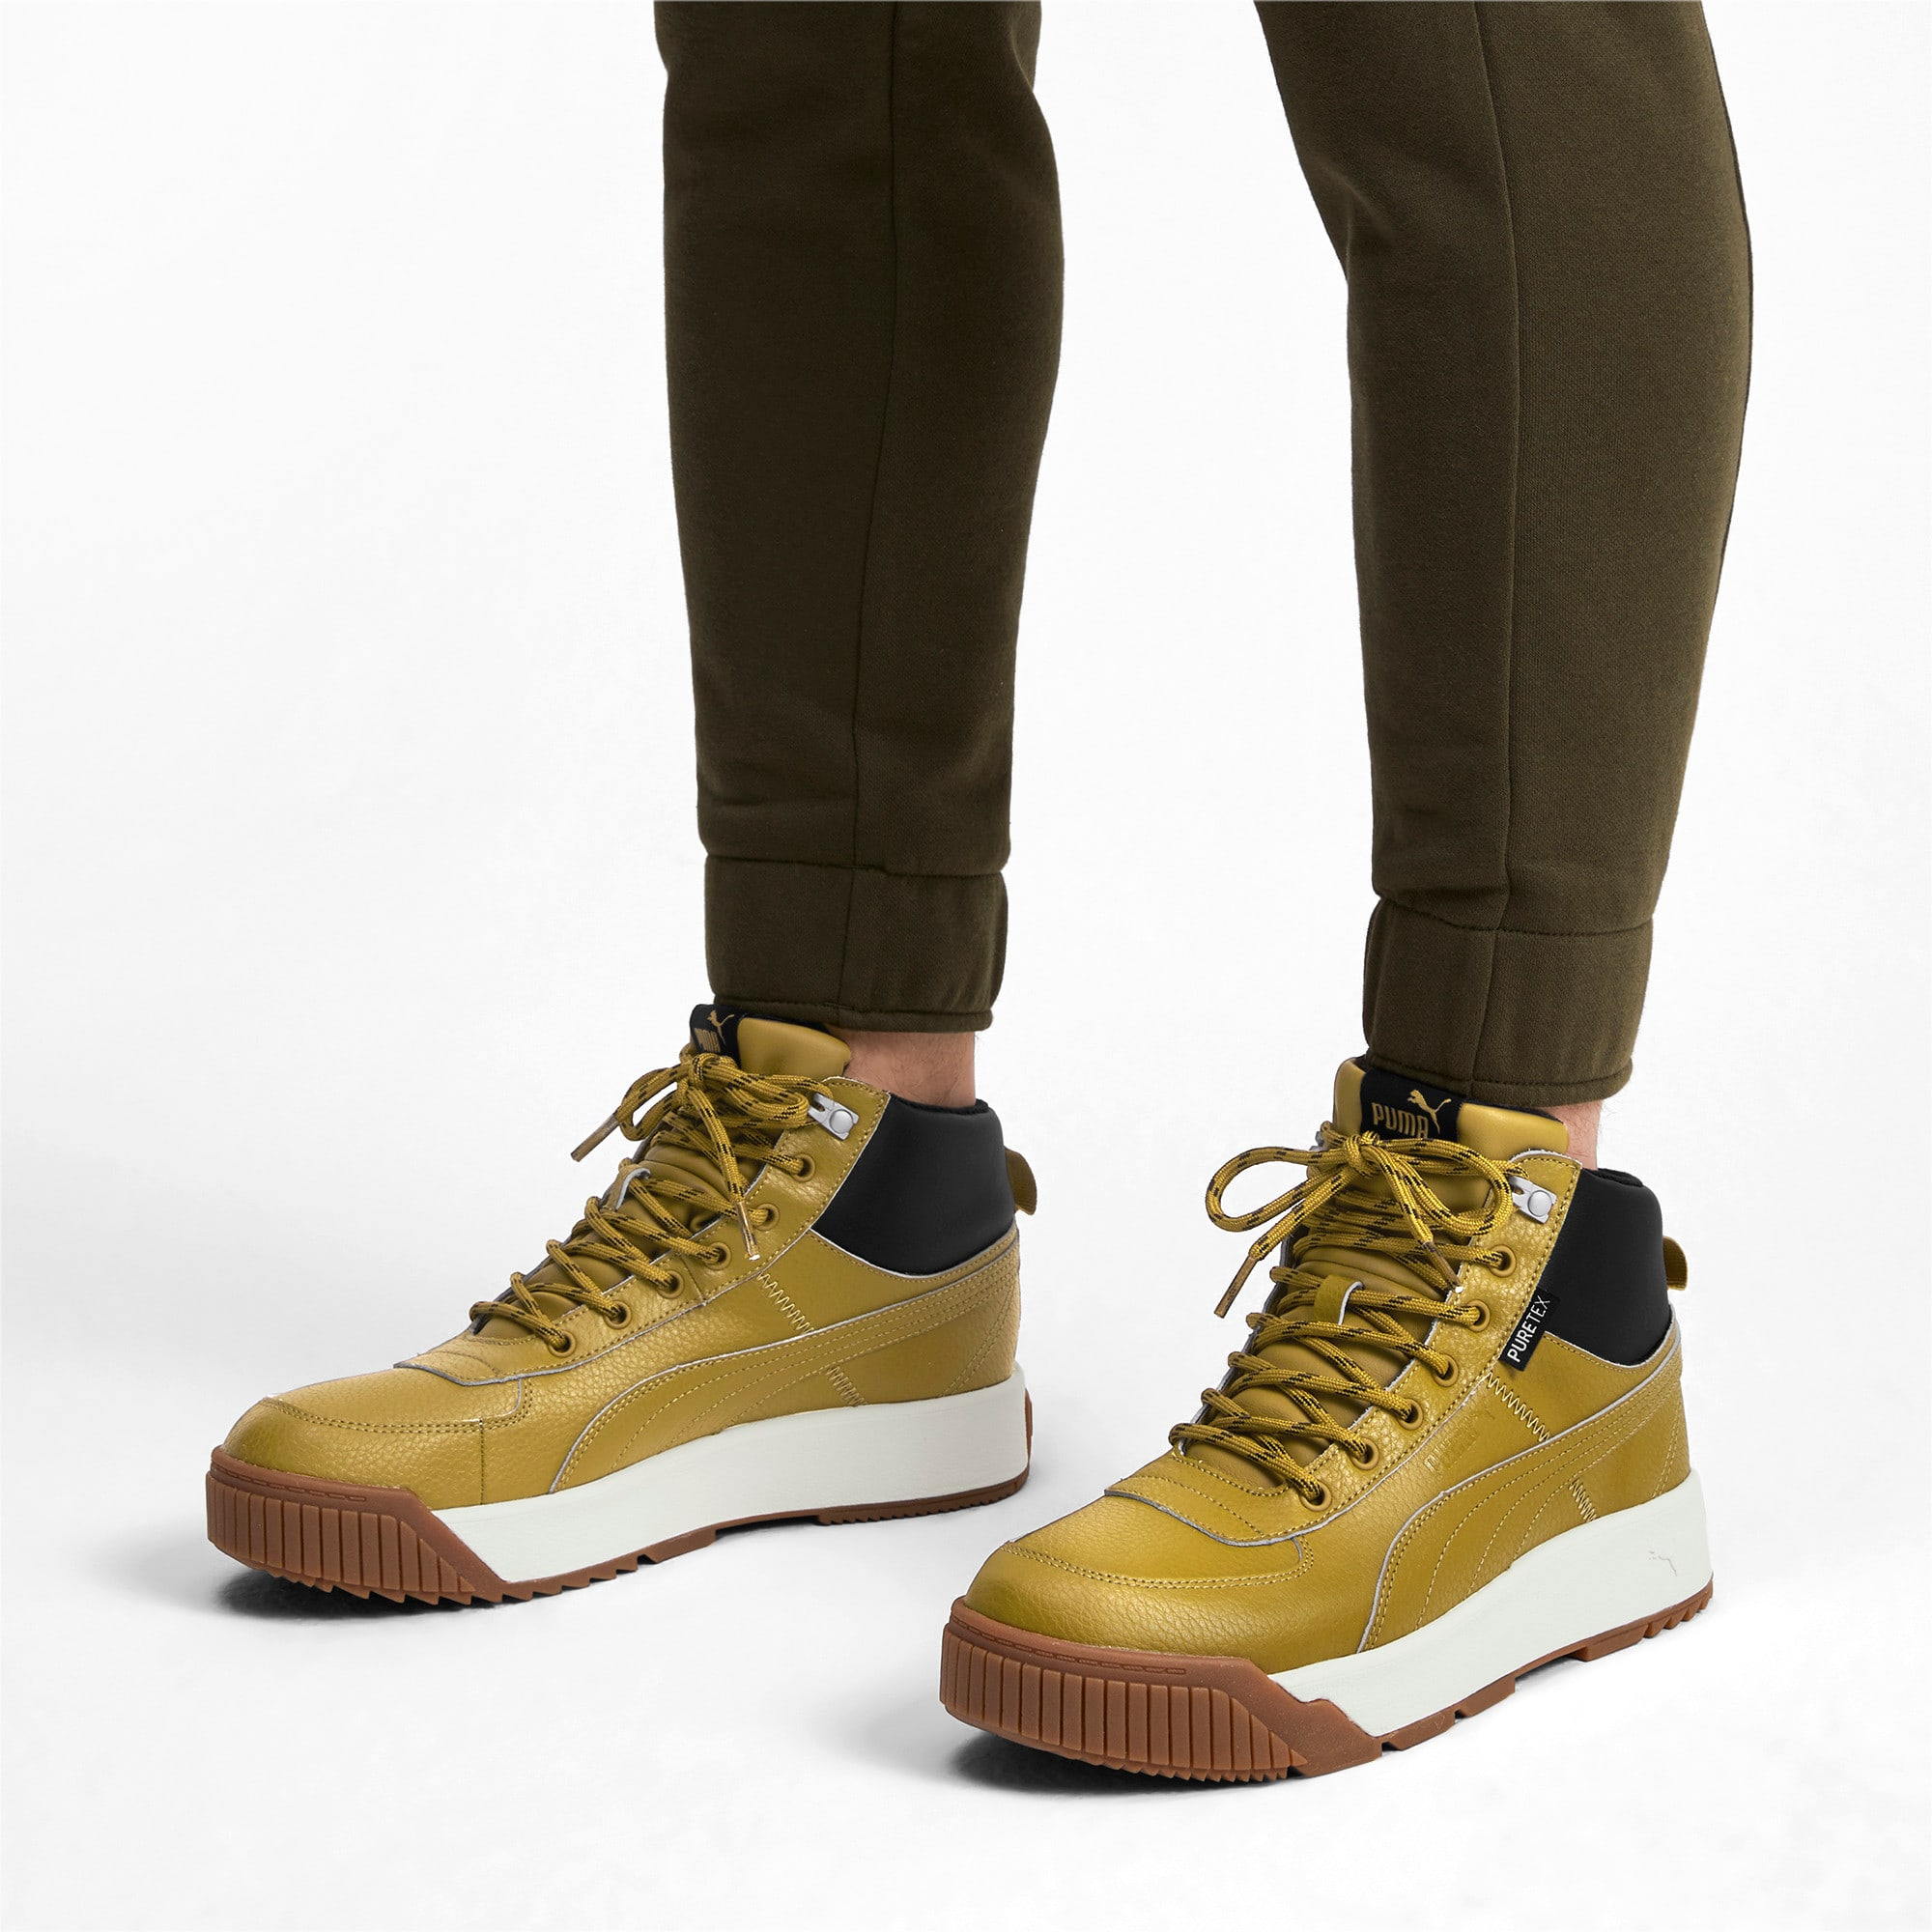 Thumbnail 2 of Tarrenz SB PURETEX Mid Sneakers, Moss Green-Puma Black, medium